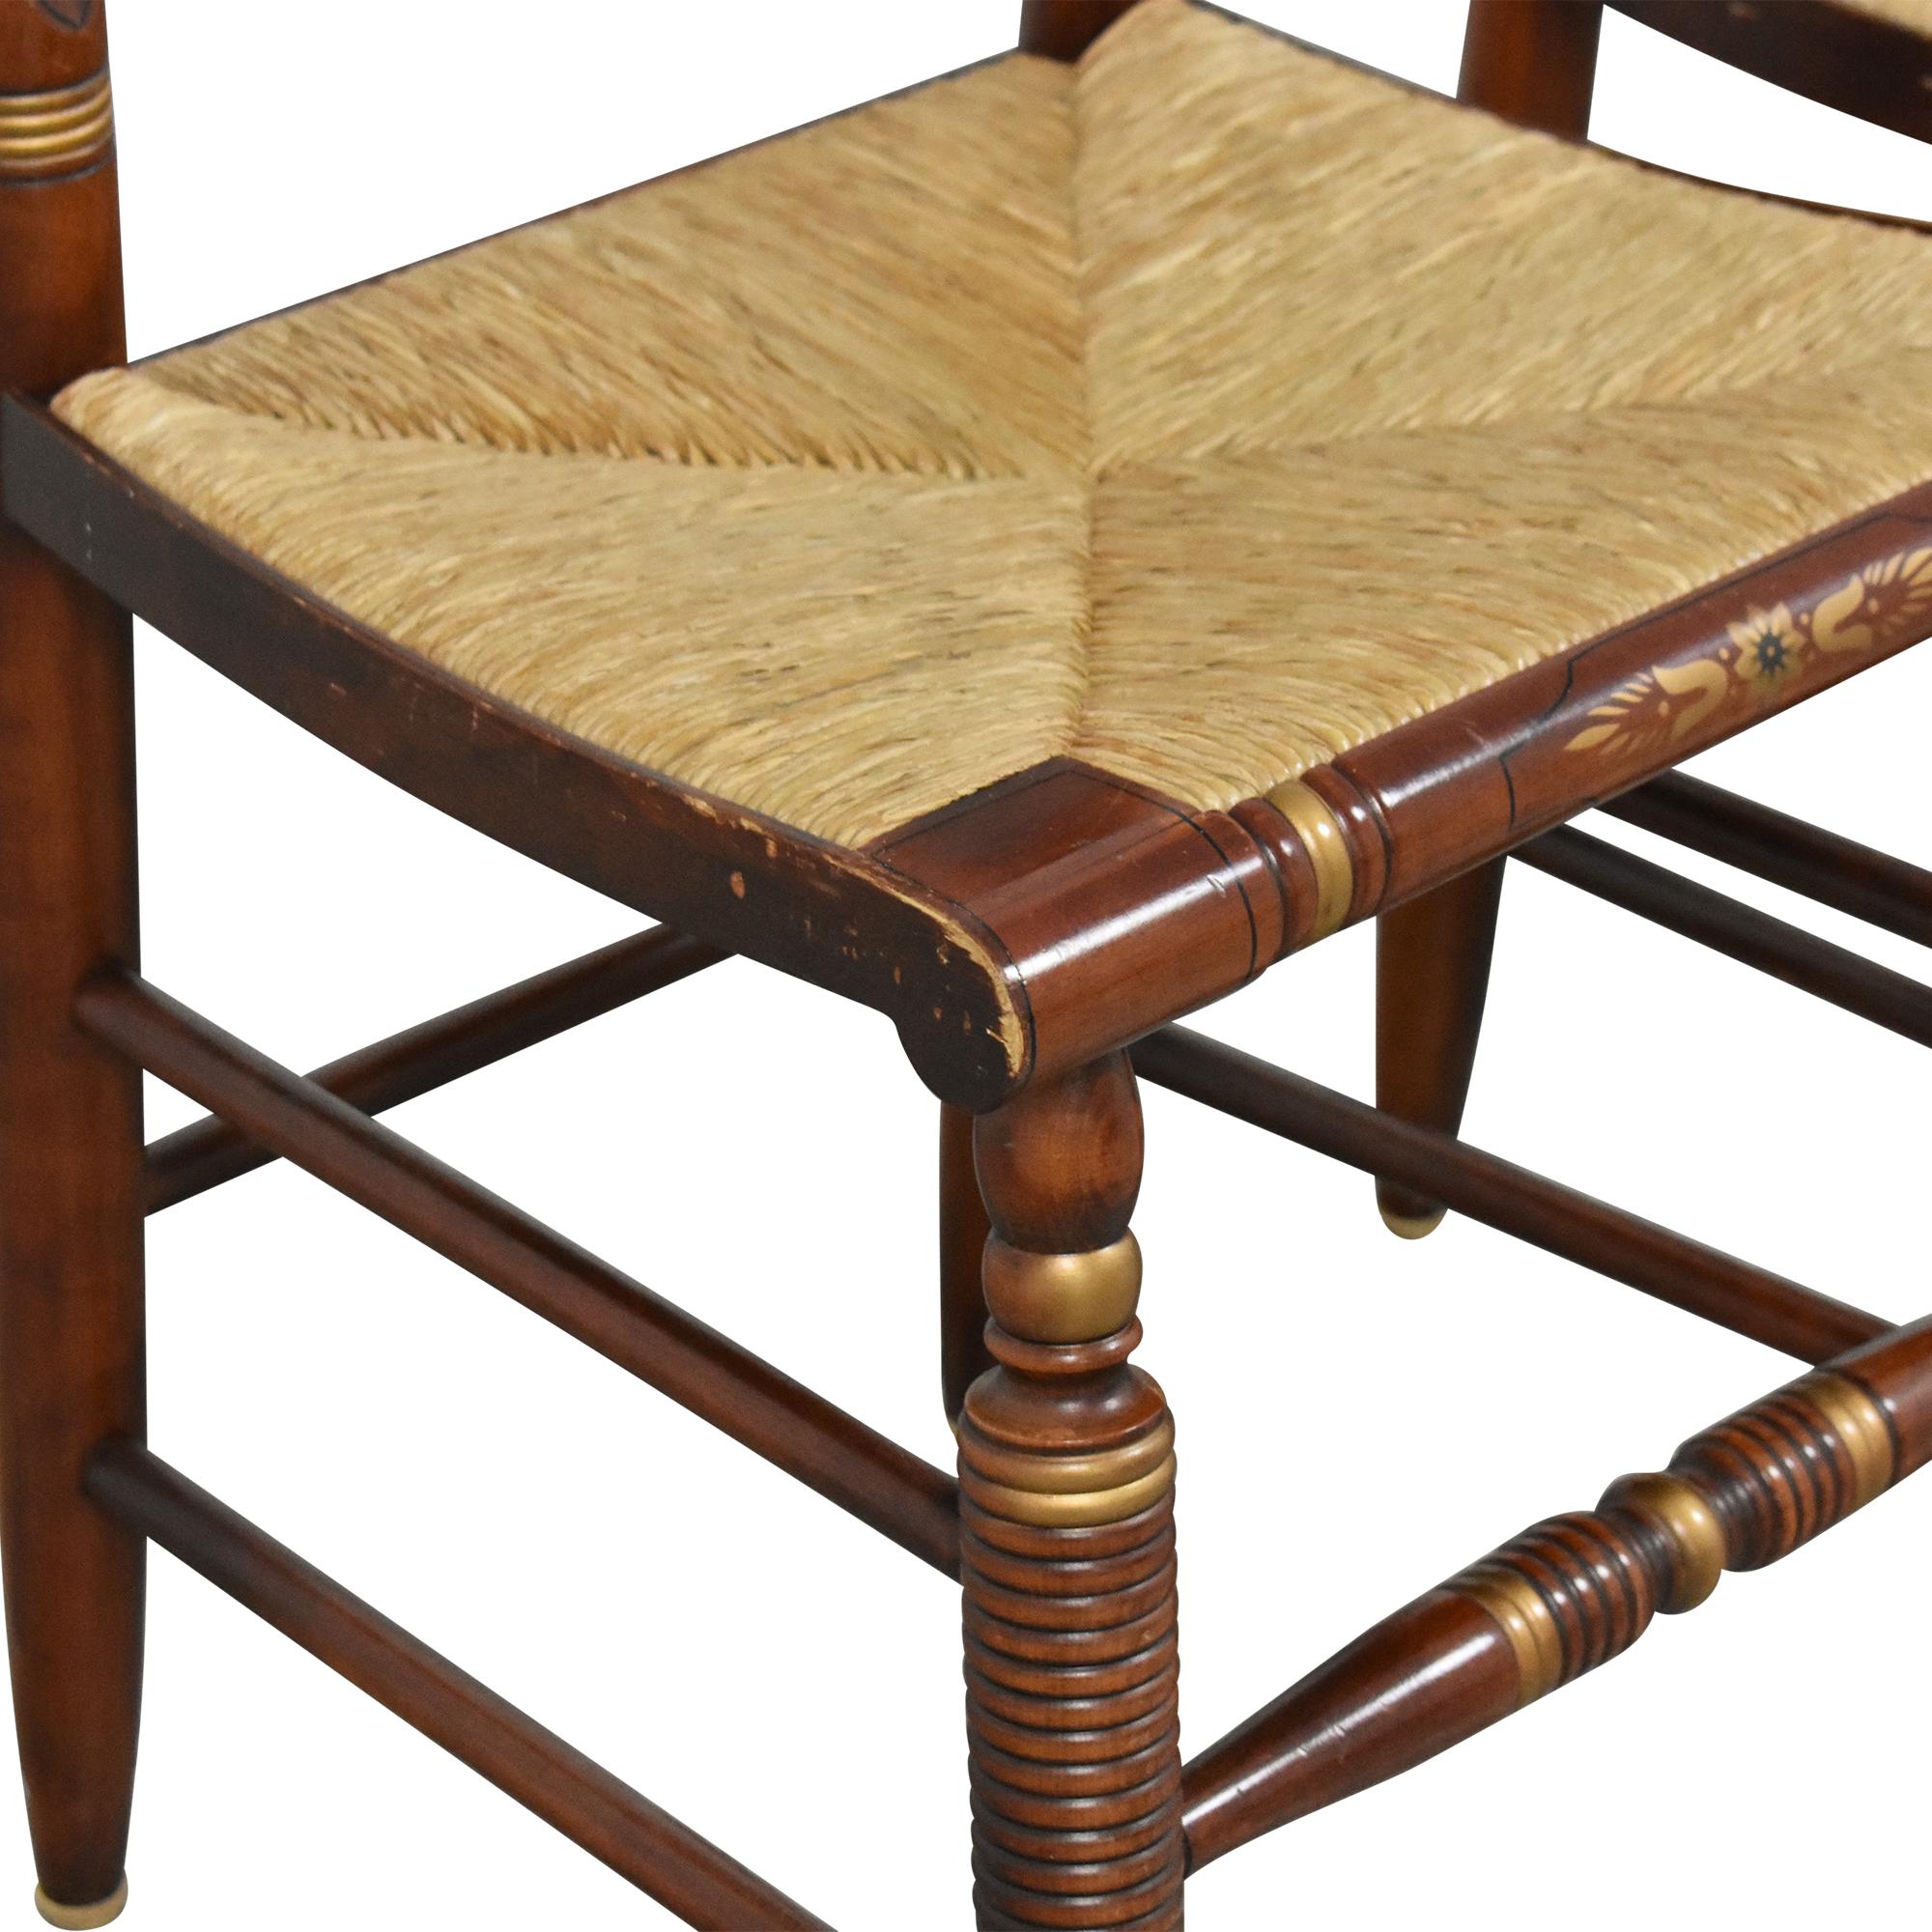 Lambert Hitchcock Lambert Hitchcock Cane Seat Dining Chairs nyc